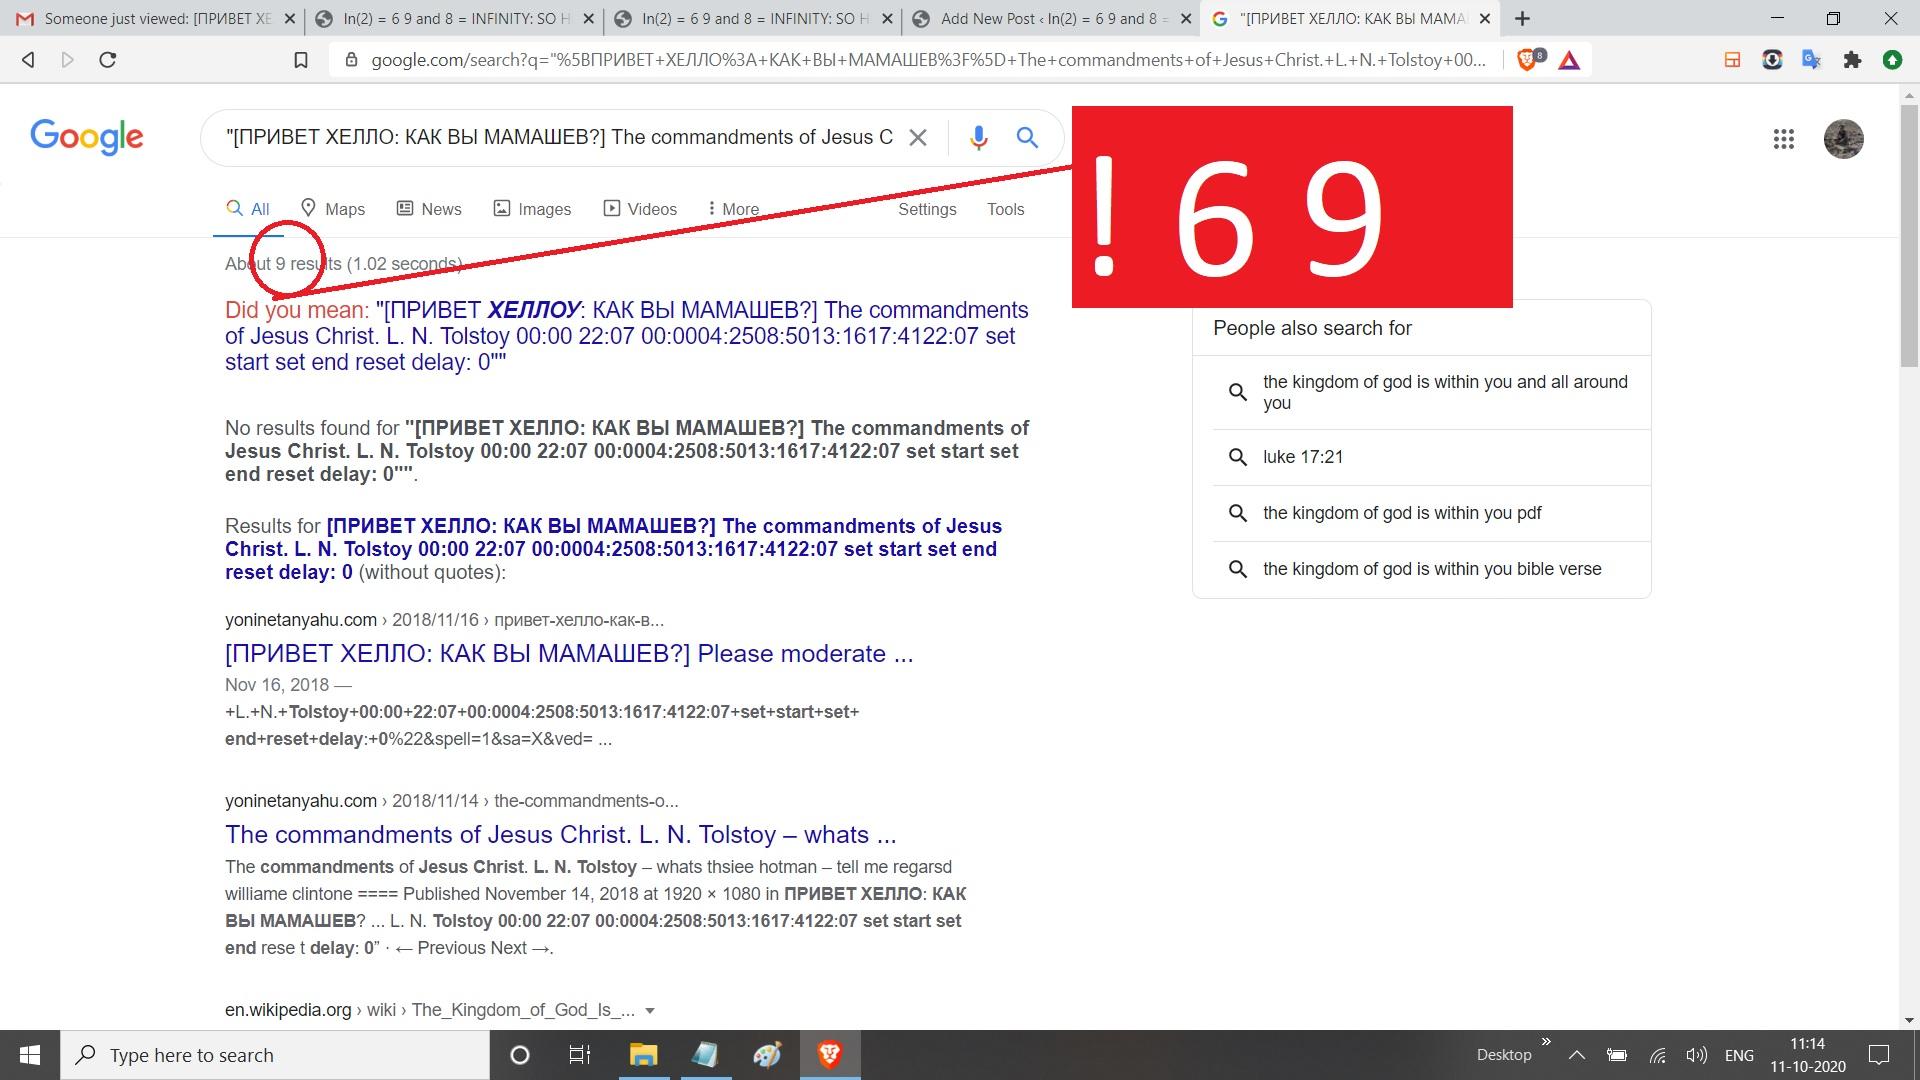 """[ПРИВЕТ ХЕЛЛО: КАК ВЫ МАМАШЕВ?] The commandments of Jesus Christ. L. N. Tolstoy 00:00 22:07 00:0004:2508:5013:1617:4122:07 set start set end reset delay: 0"""""